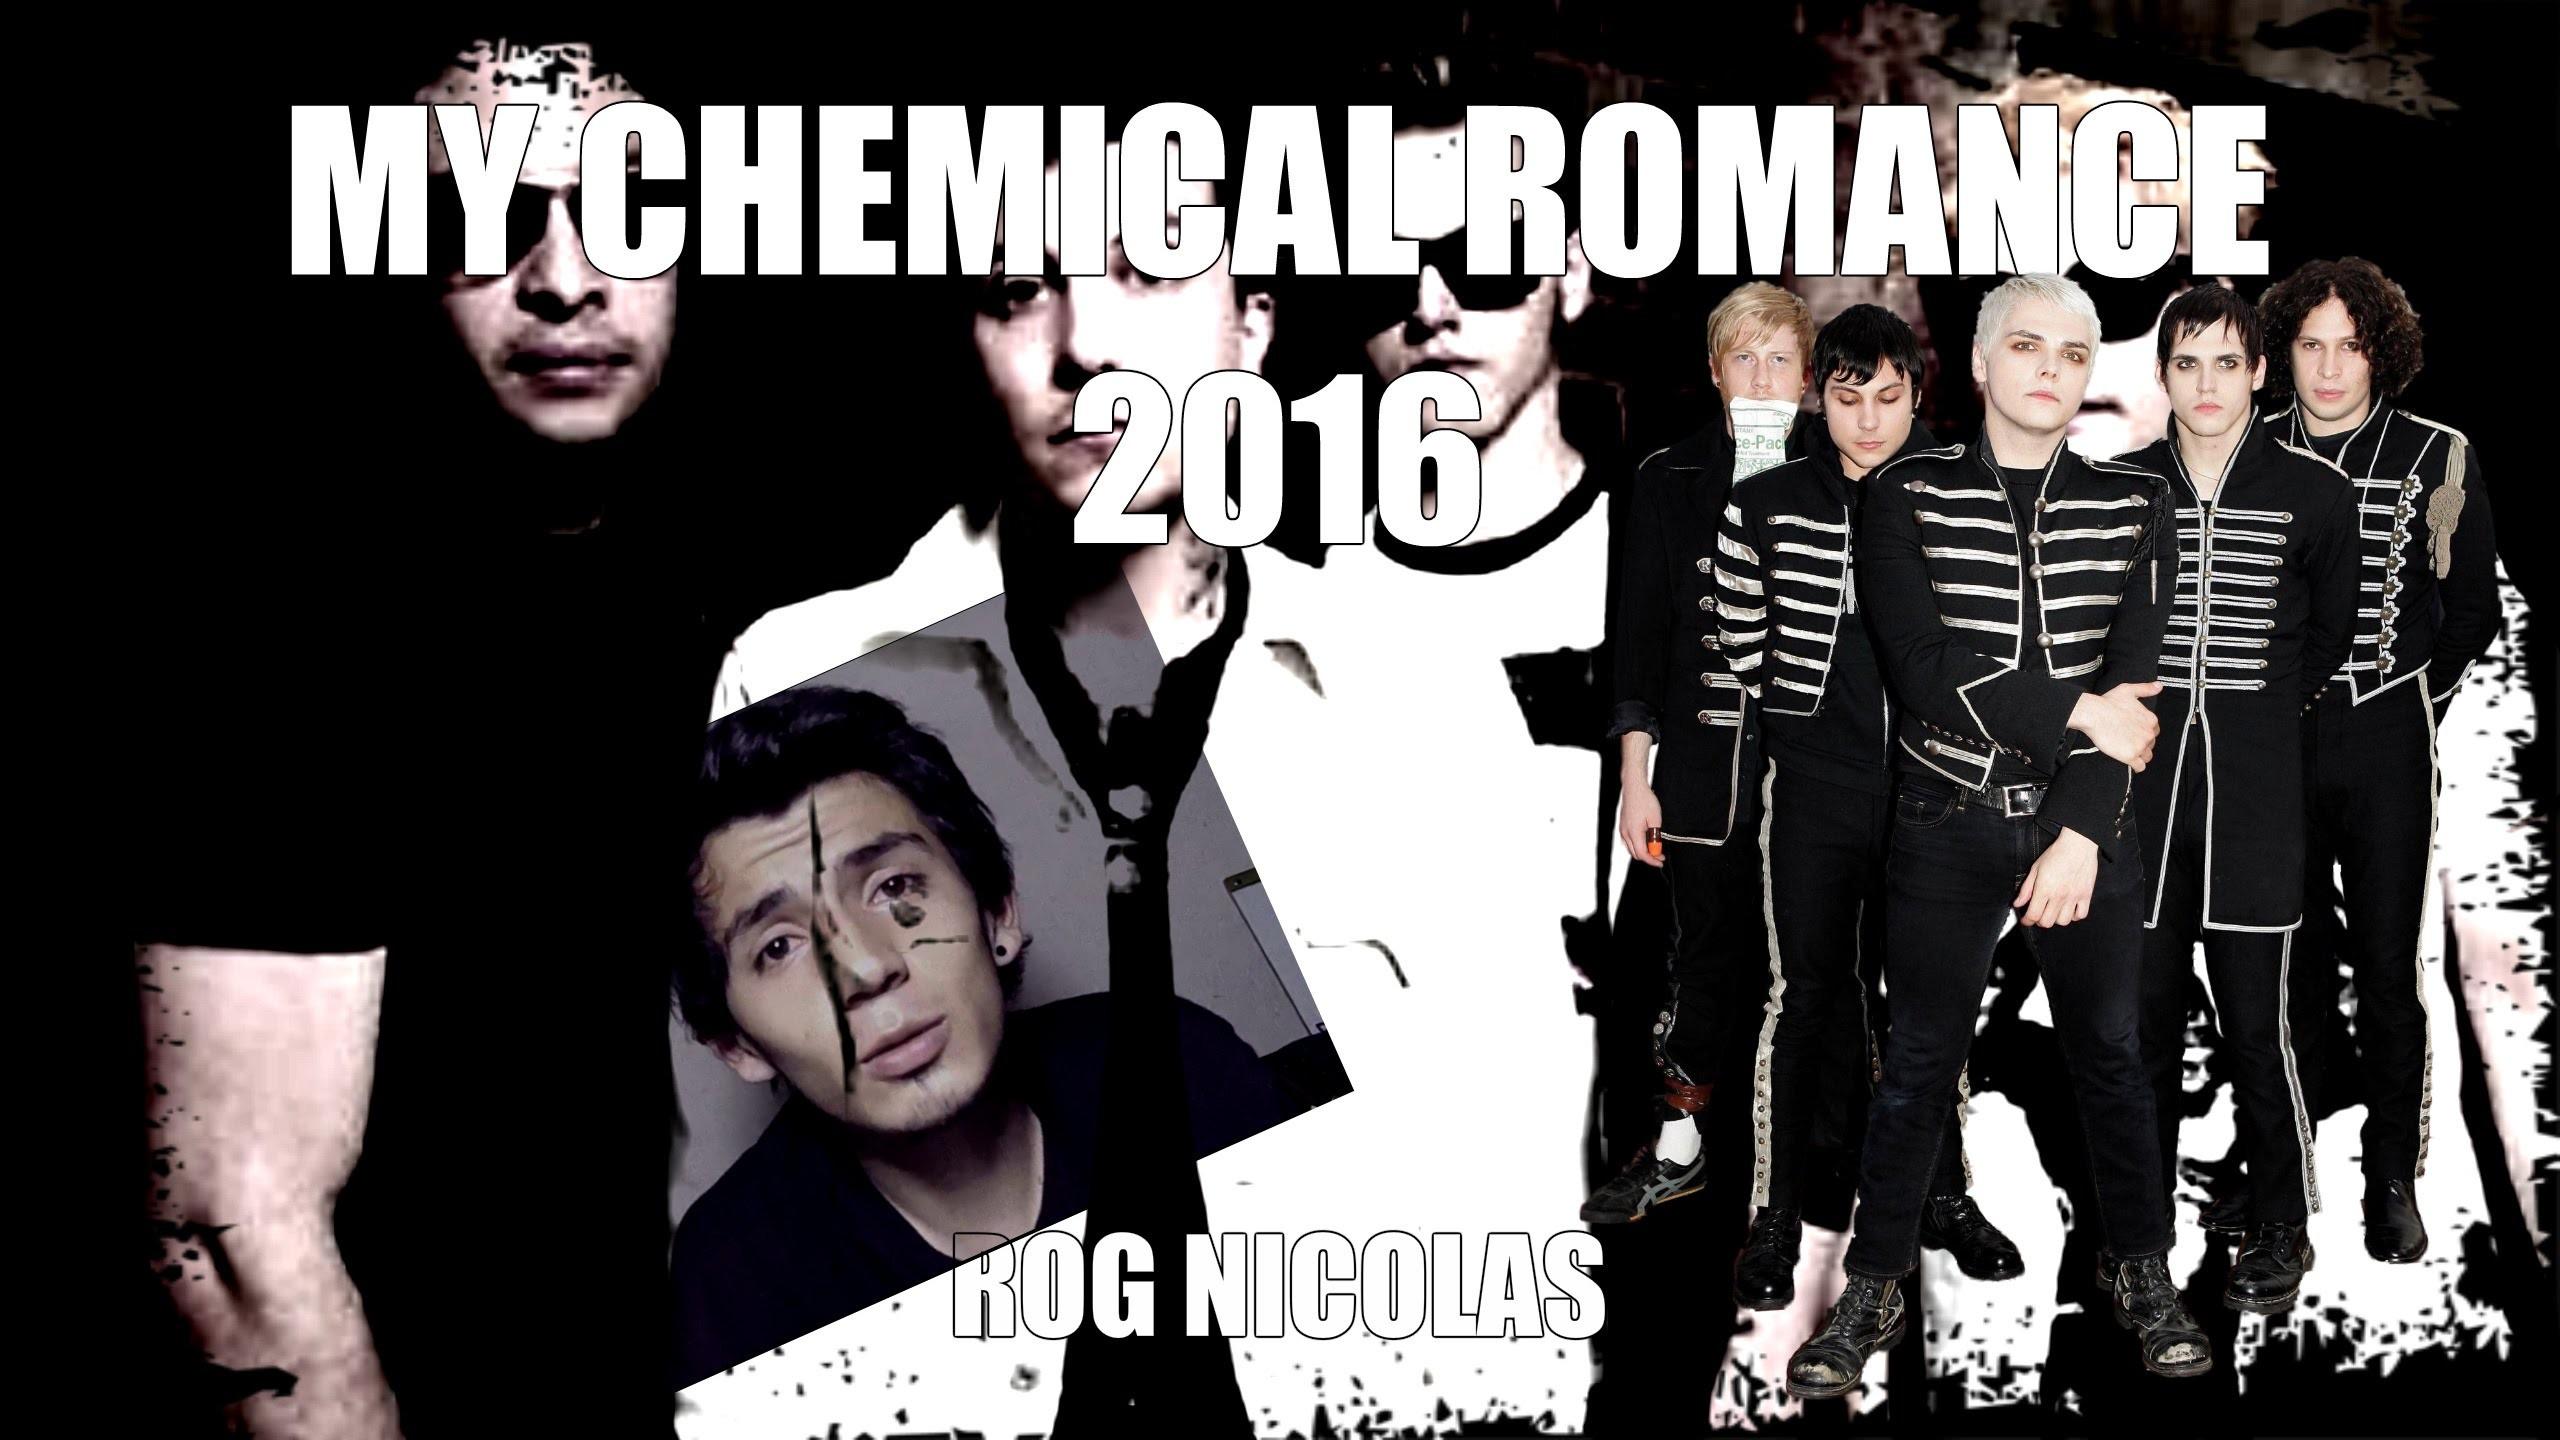 MY CHEMICAL ROMANCE 2016 – Rog Nicolas